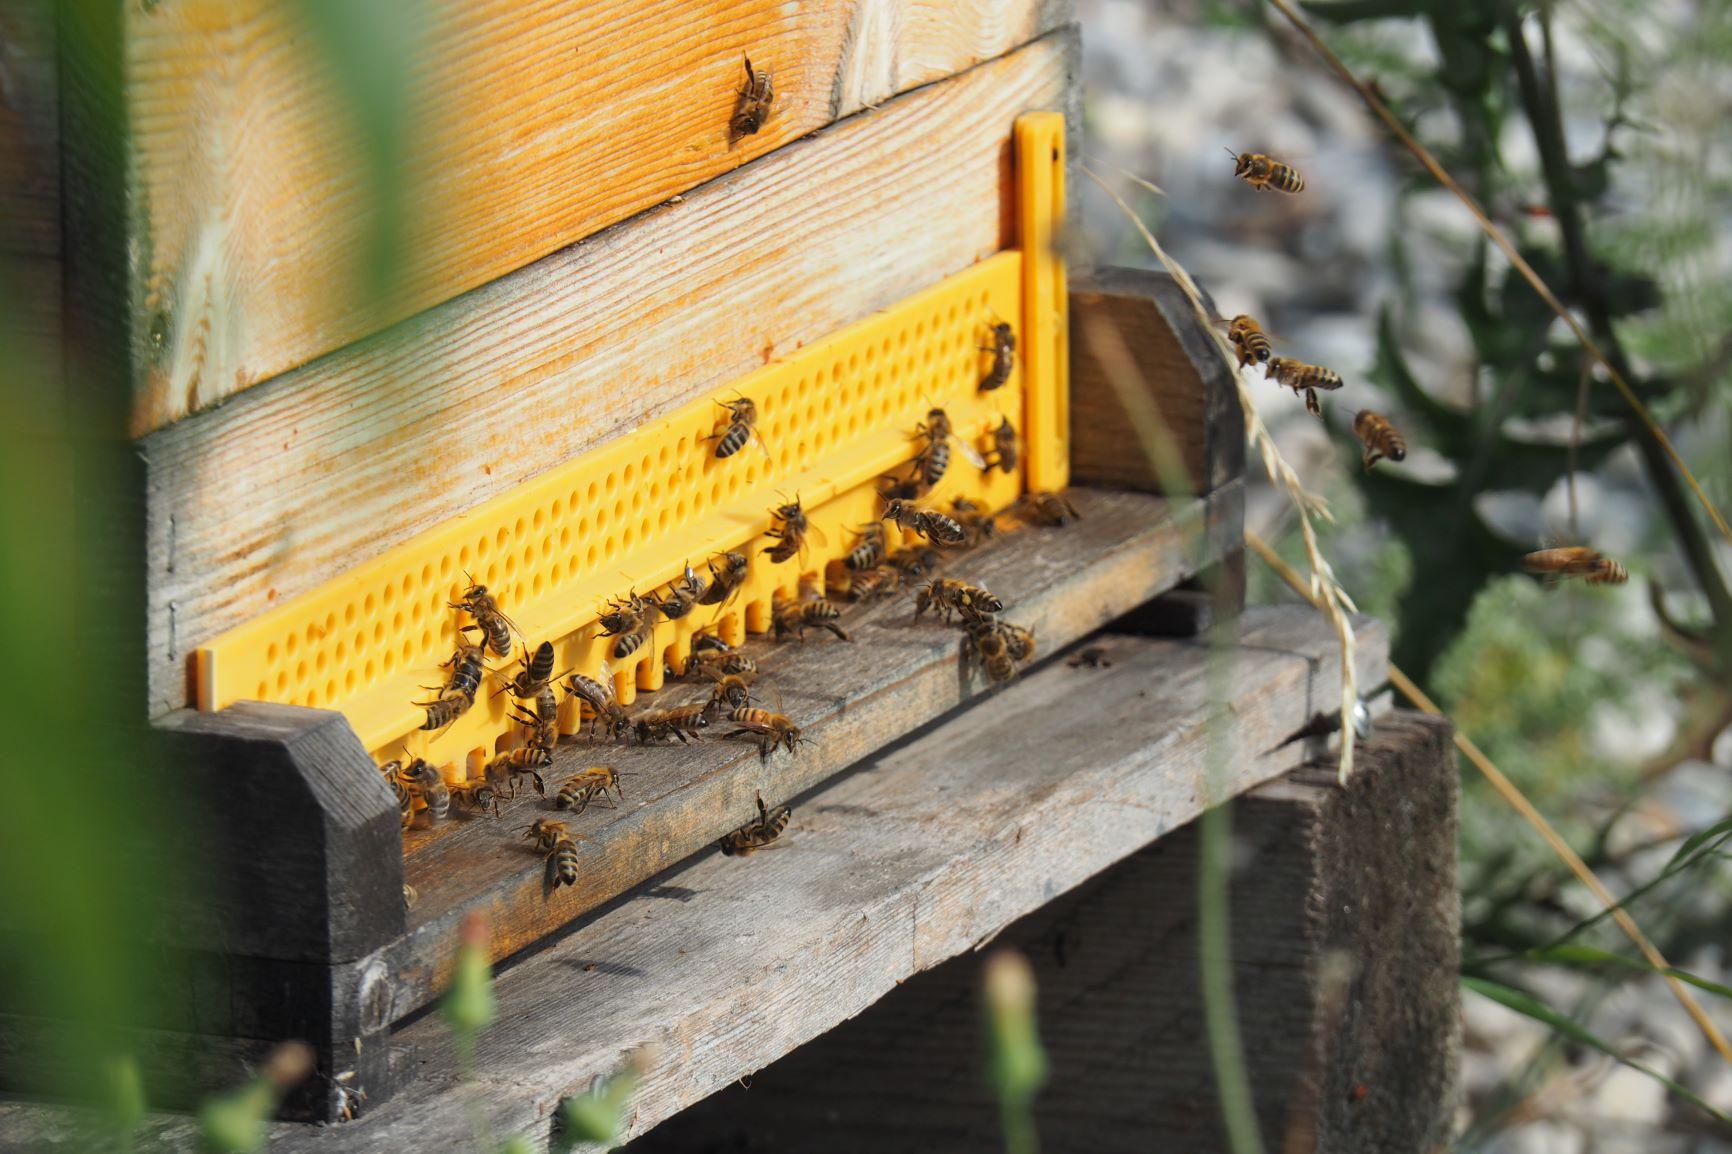 Bienenstock der Imkerei in Theresienfeld